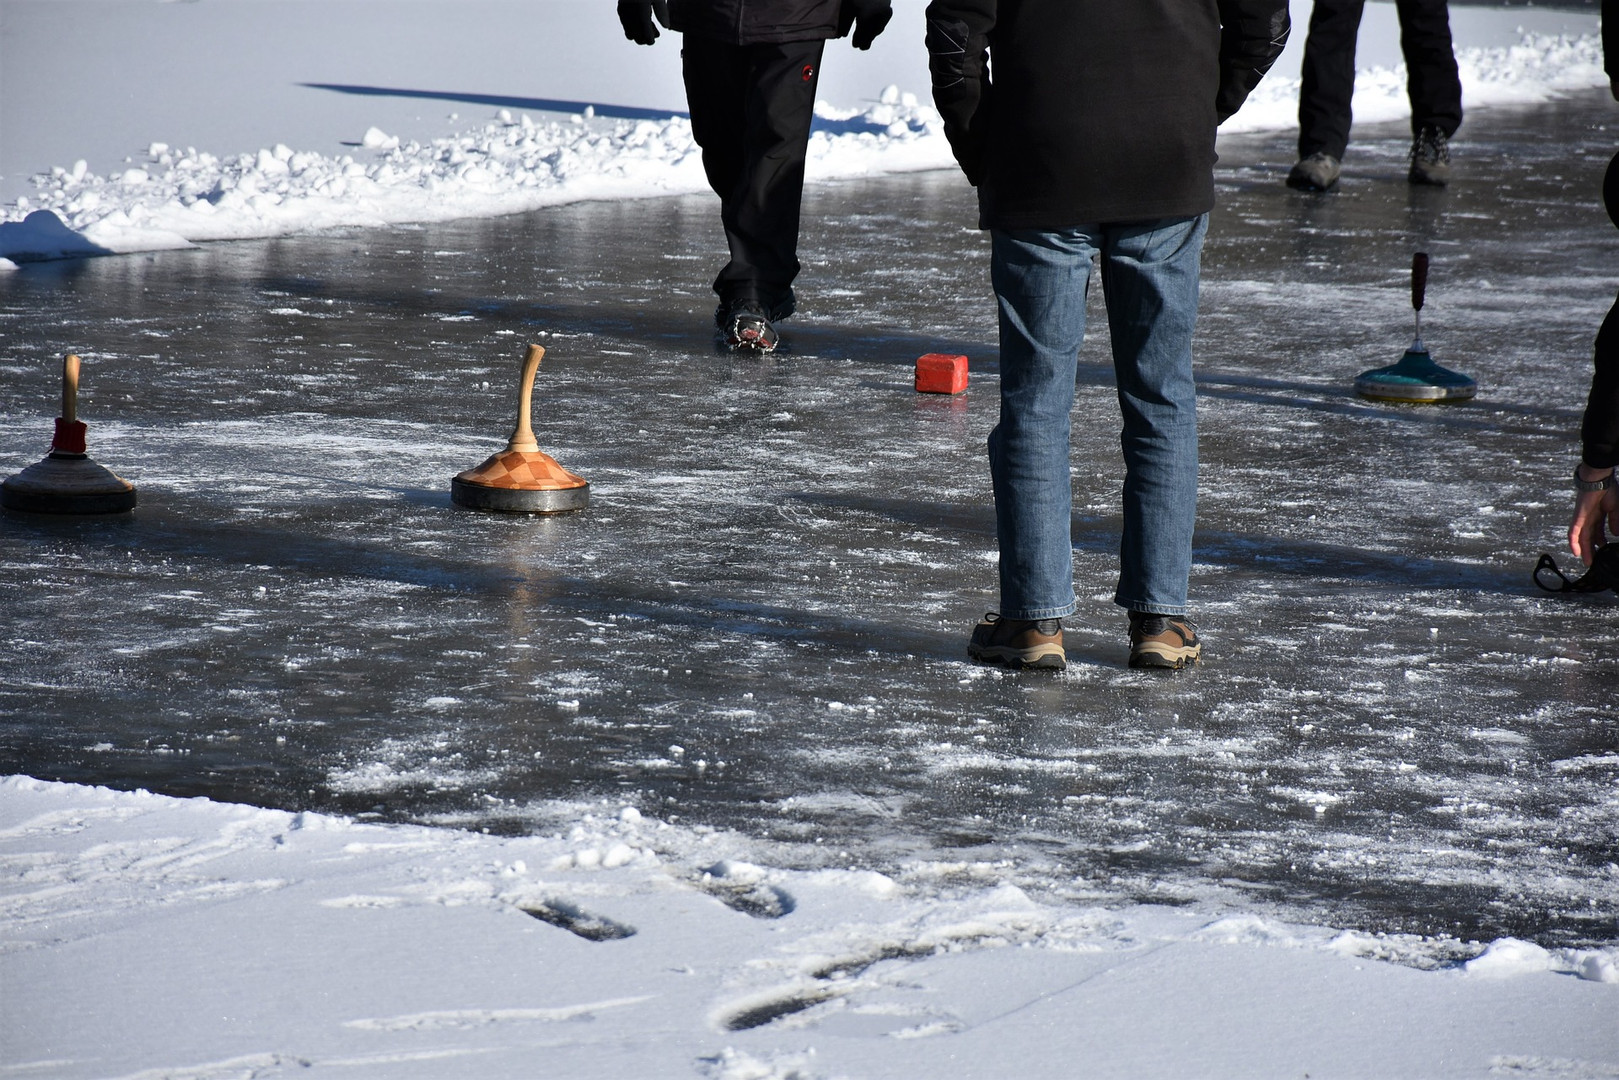 Ice Curling